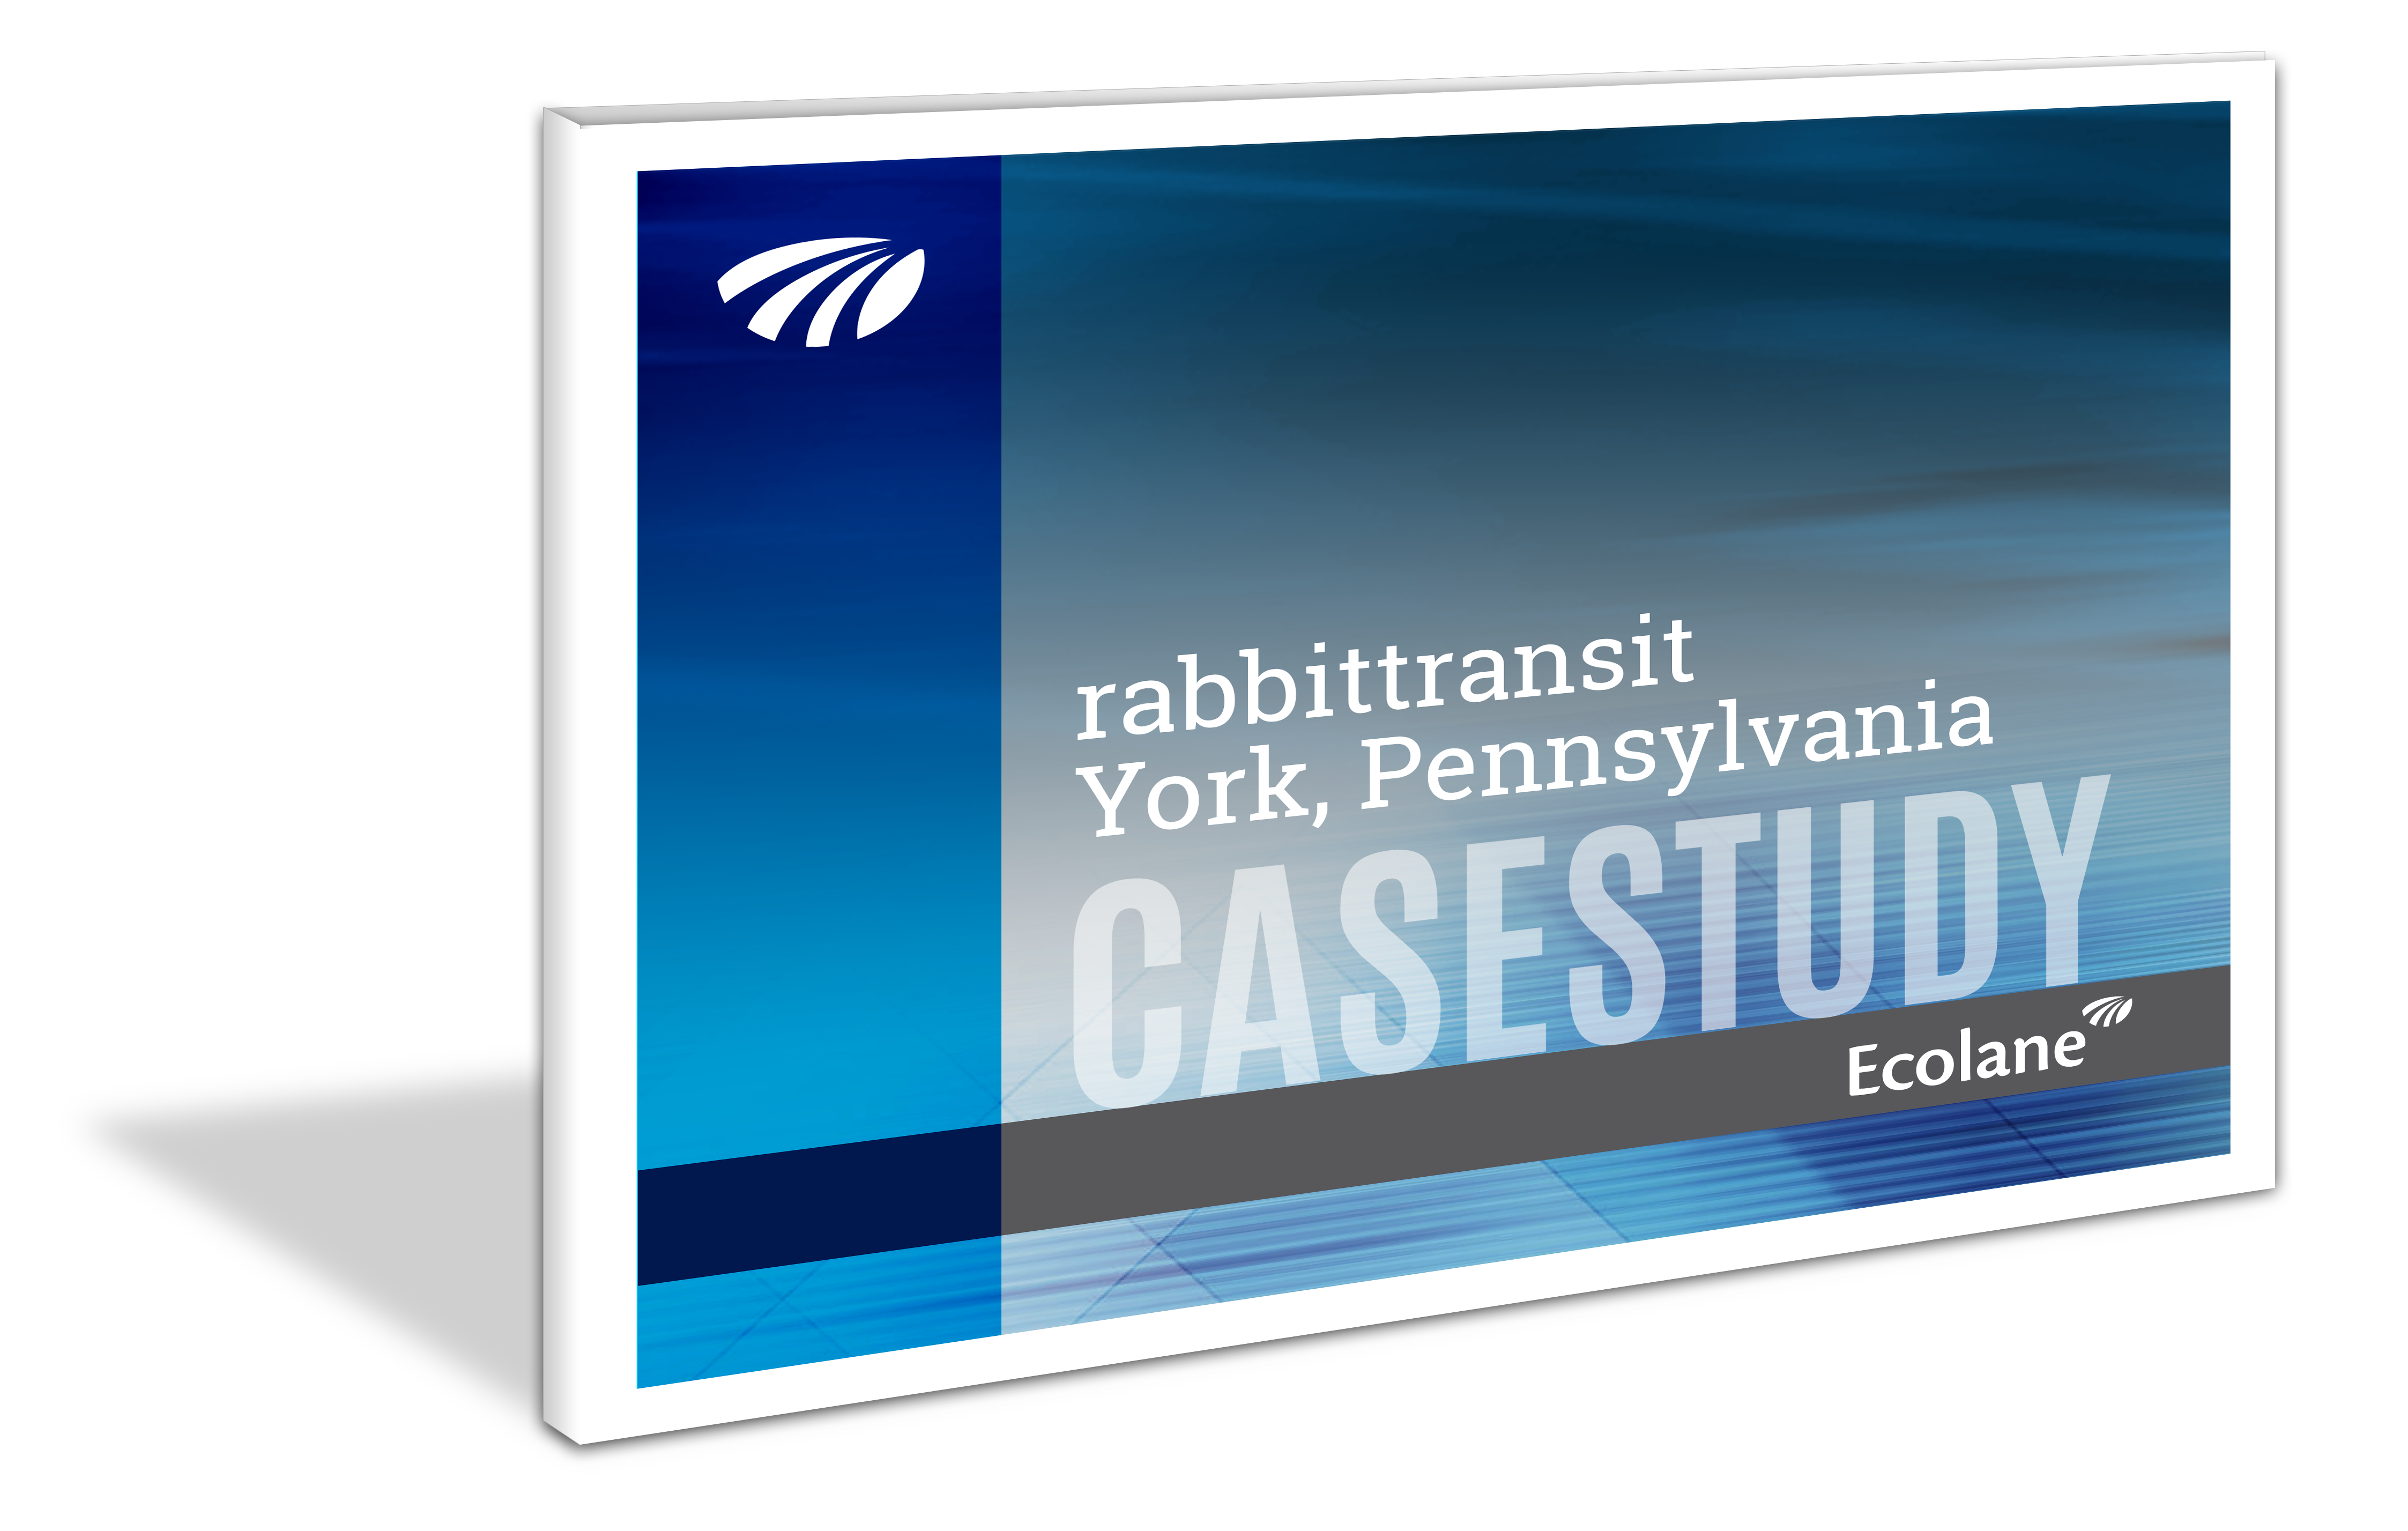 rabbittransit case study